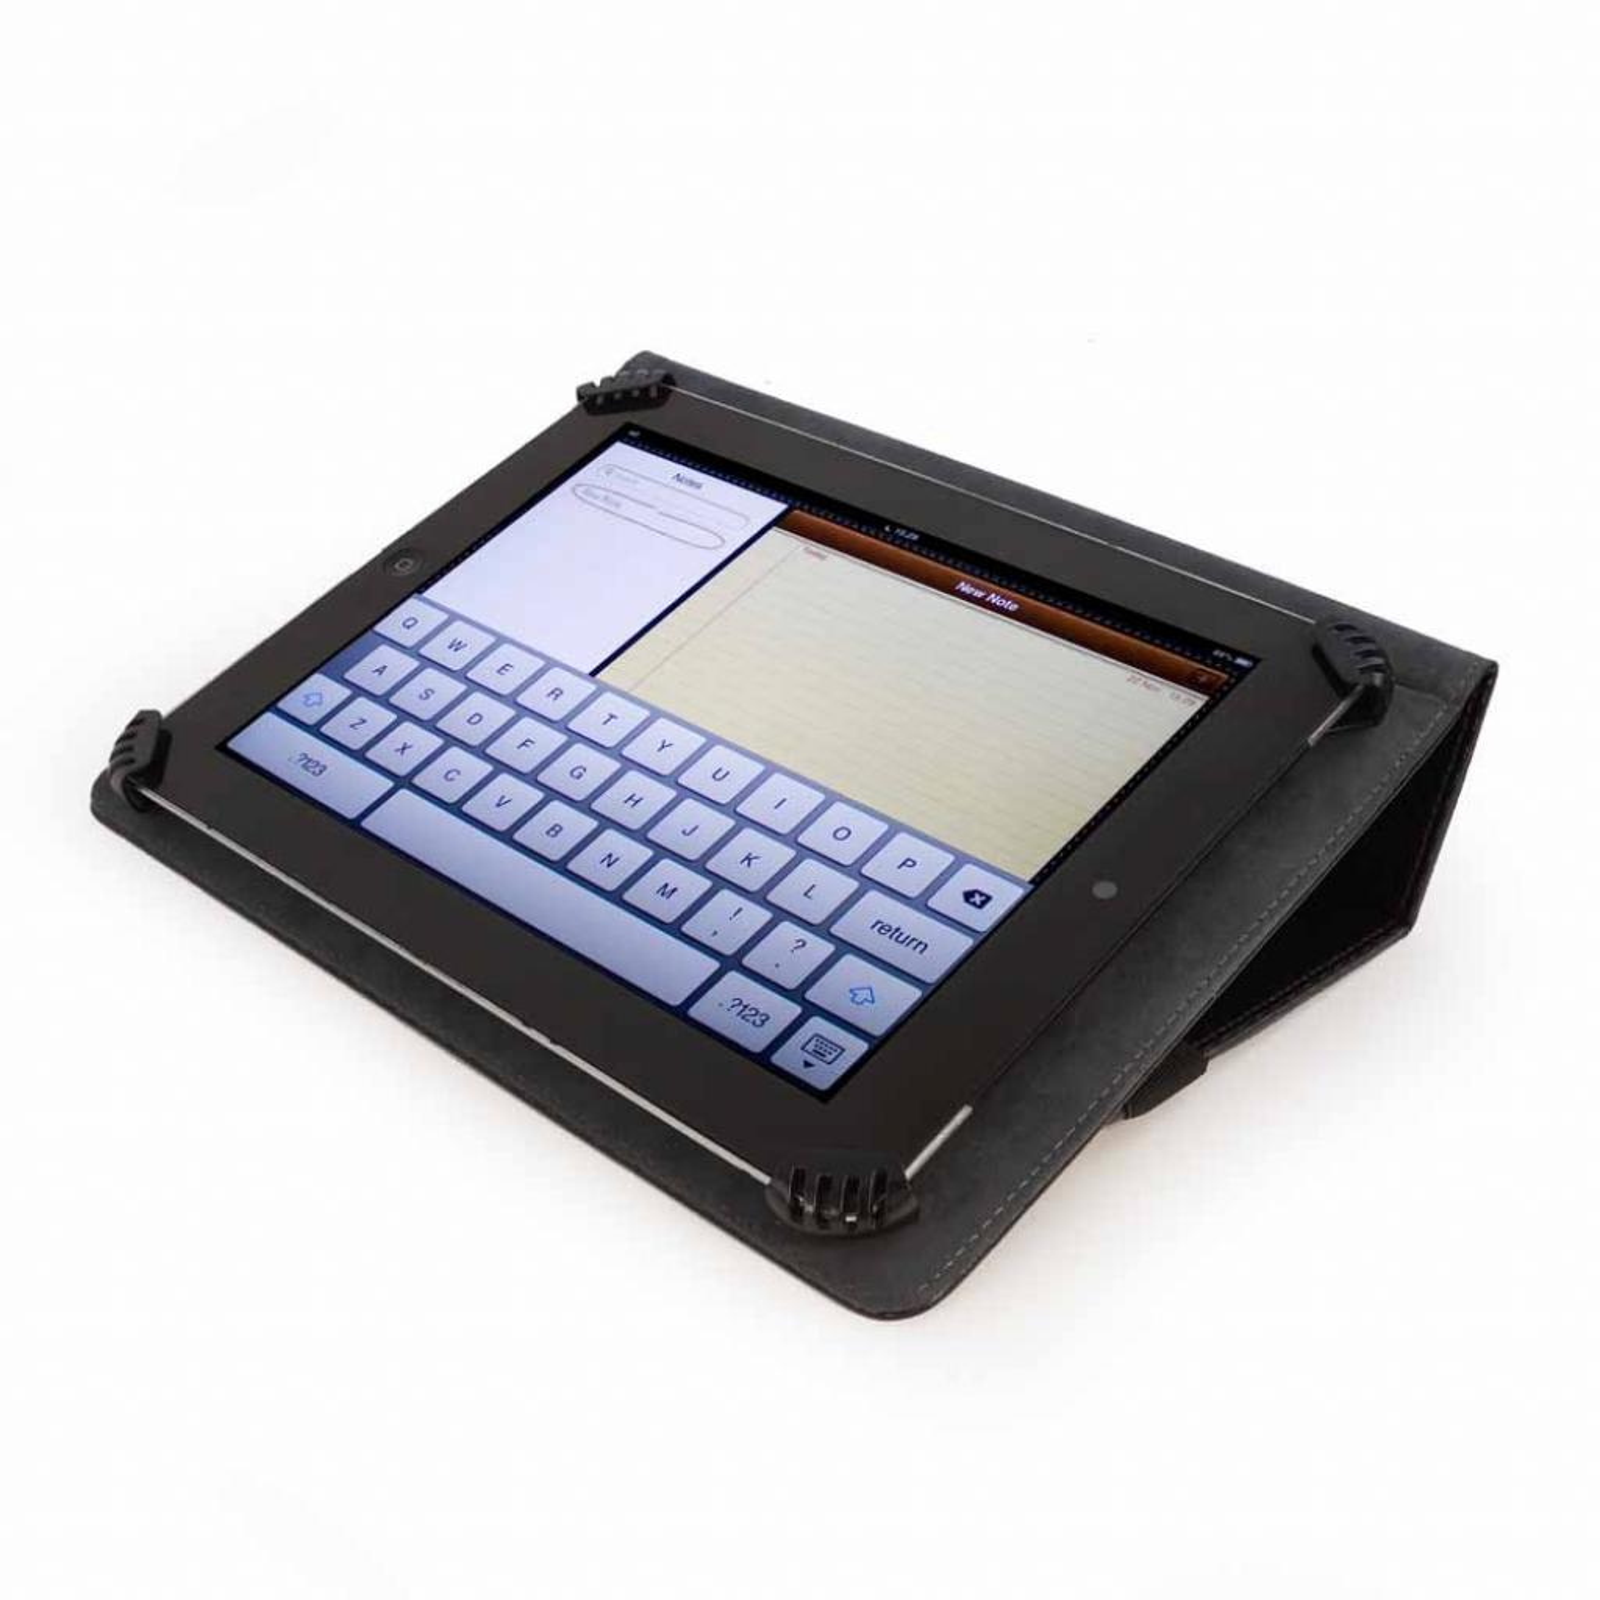 Чехол для планшета Tuff-Luv 10 Uni-View Black Carbon (A3_45) изображение 5